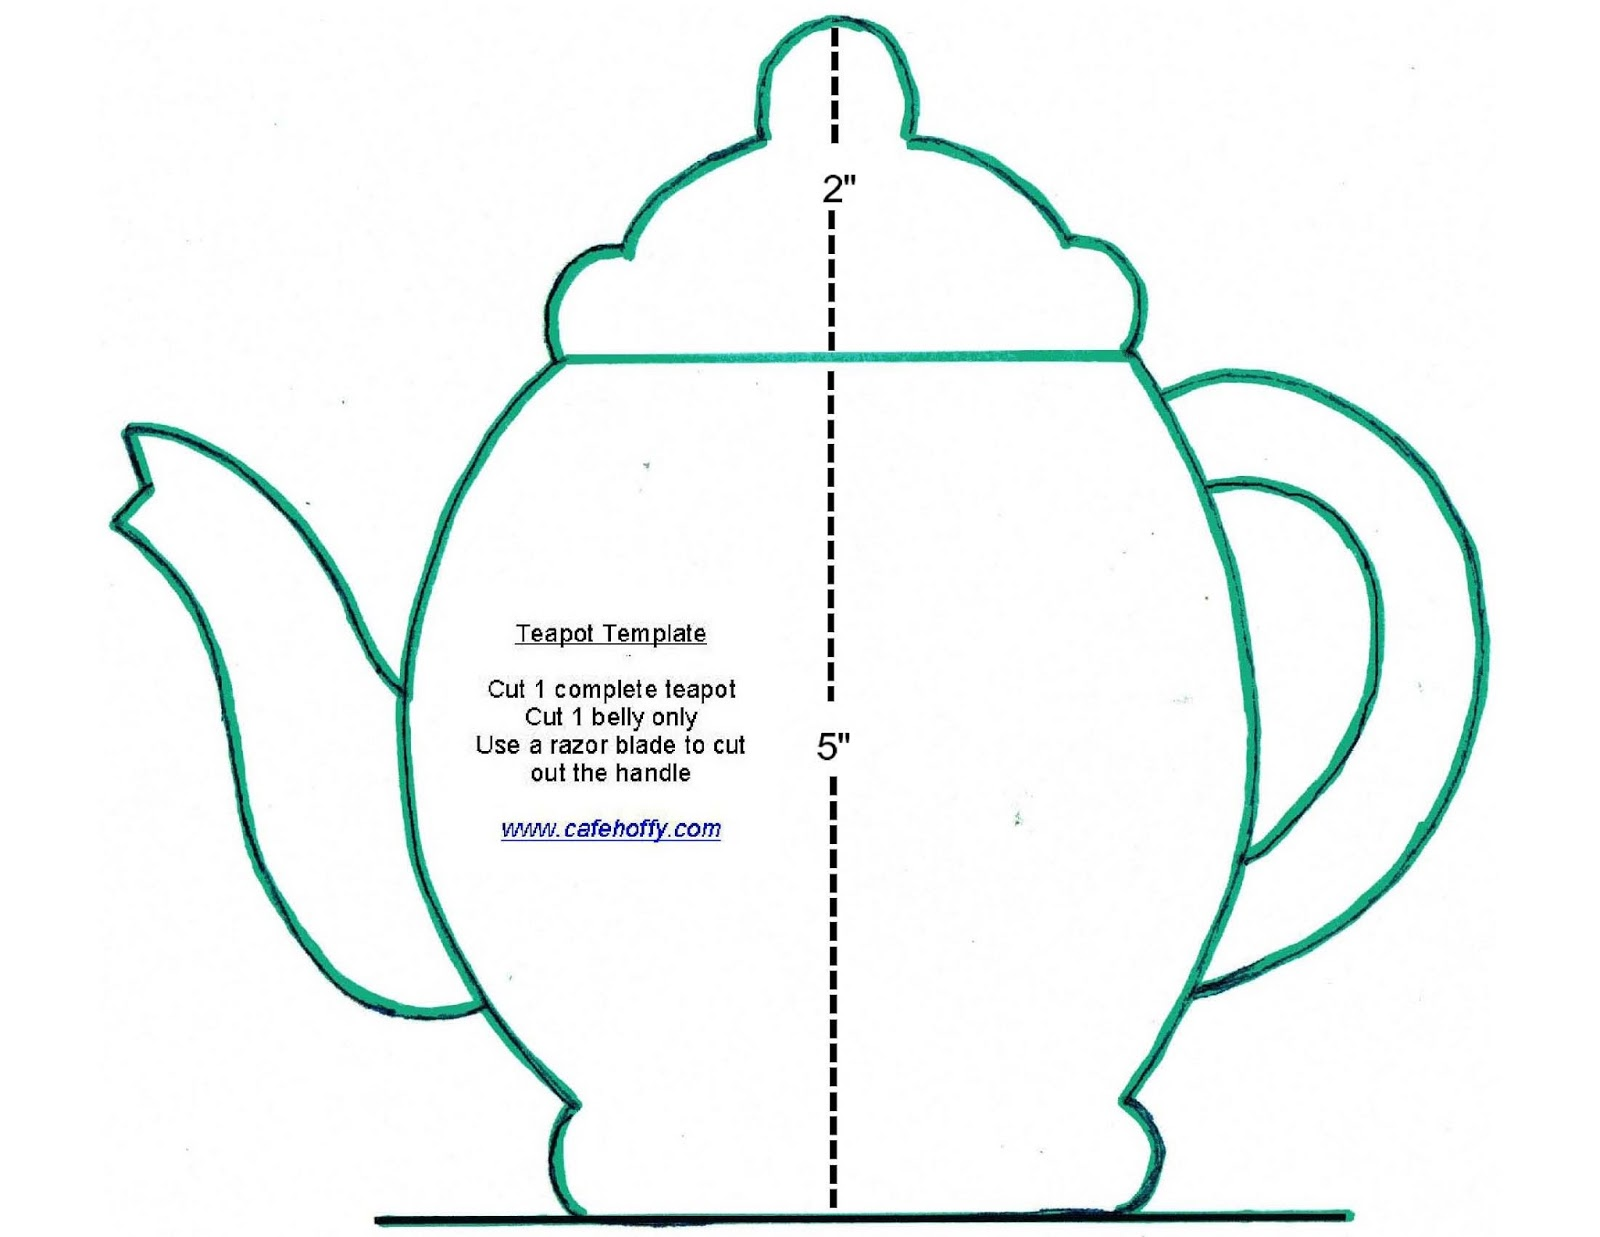 Teapot template